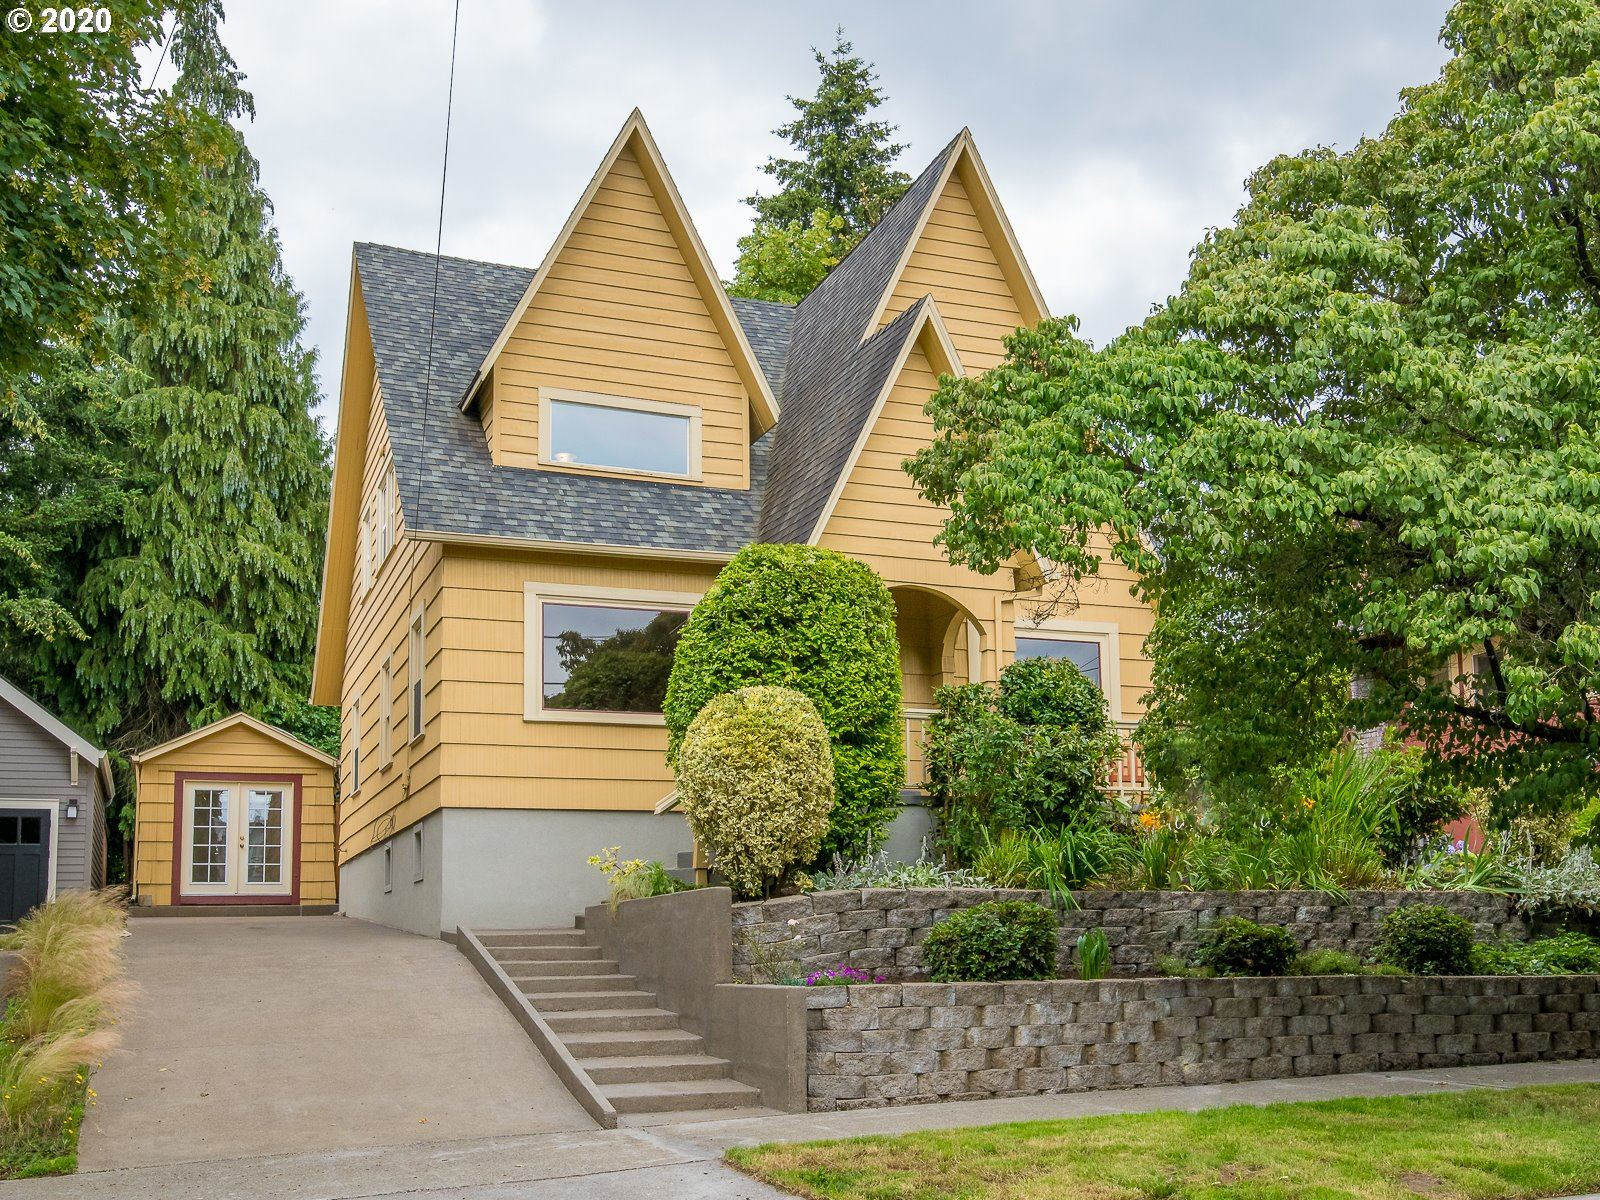 2204 NE 50TH AVE, Portland, OR 97213 - MLS#: 20203790